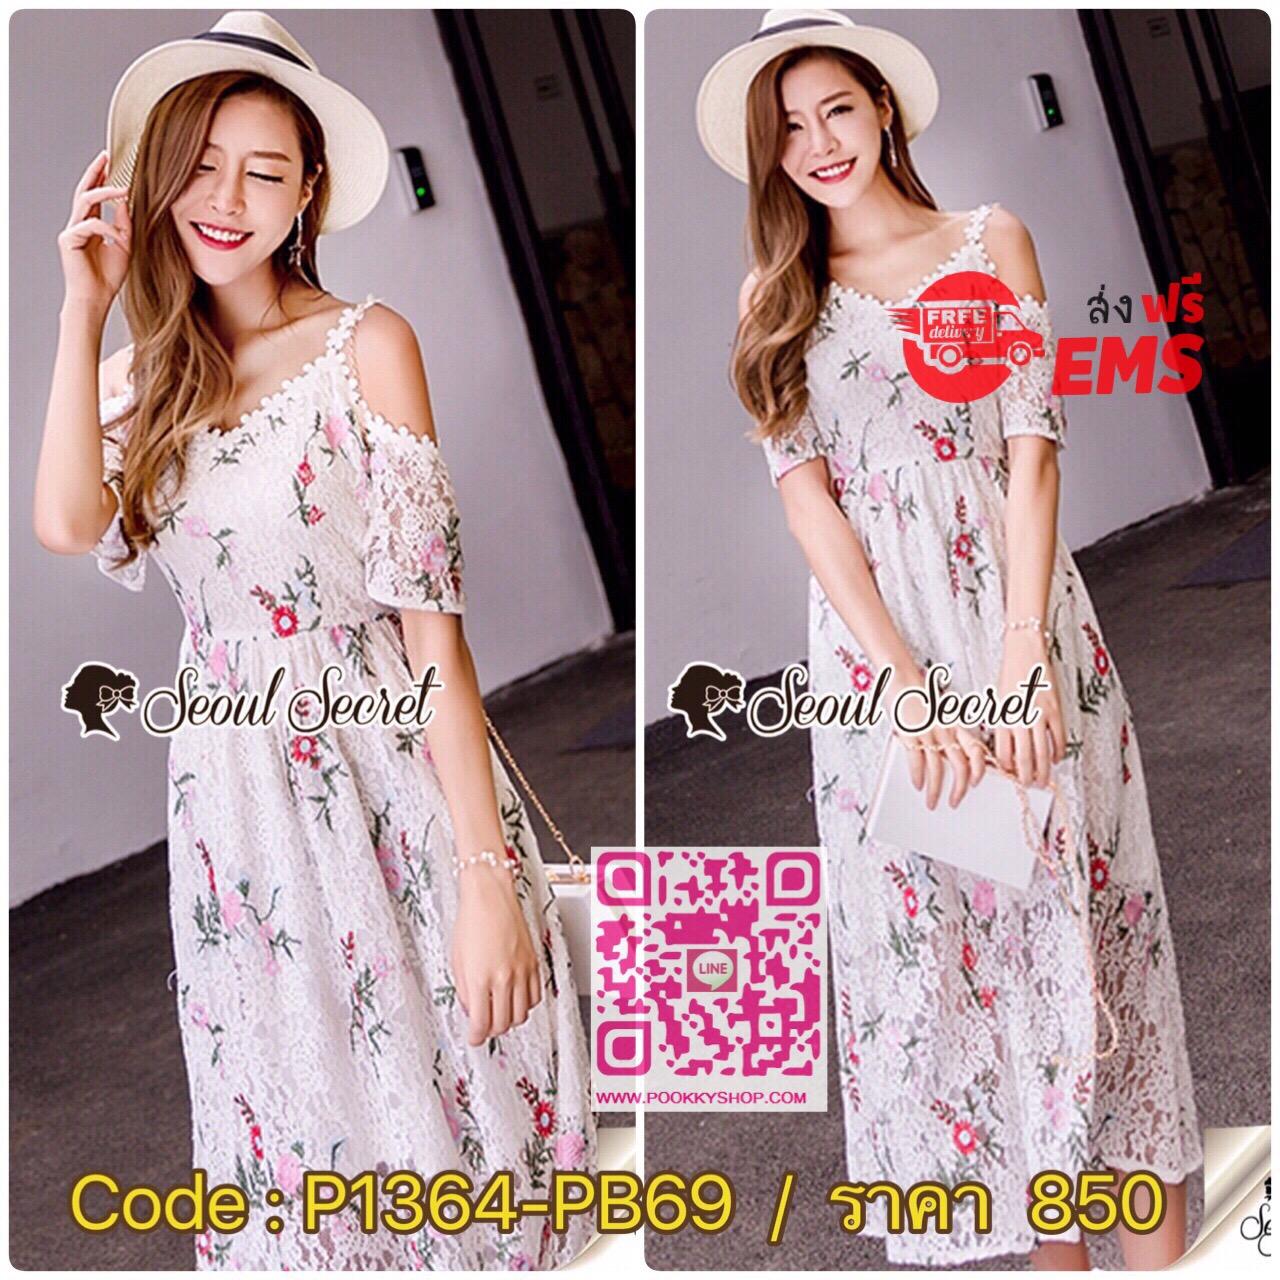 Seoul Secret Say's...Daisy Cami Tie Lace Flora Maxi Dress Material : งานสวยด้วยทรงแม๊กซี่เดรส ทรงสวยด้วยทรงเดรสสายเดี่ยวเว้าไหล่ สายเดรสและขอบอกขอบแขนมีดีเทลสวยๆ ด้วยงานเย็บแต่งด้วยริบบิ้นลายดอกไม้ เนื้อผ้าสวยหวานด้วยเนื้อผ้าลูกไม้ปักลายดอกไม้ทั้งตัว